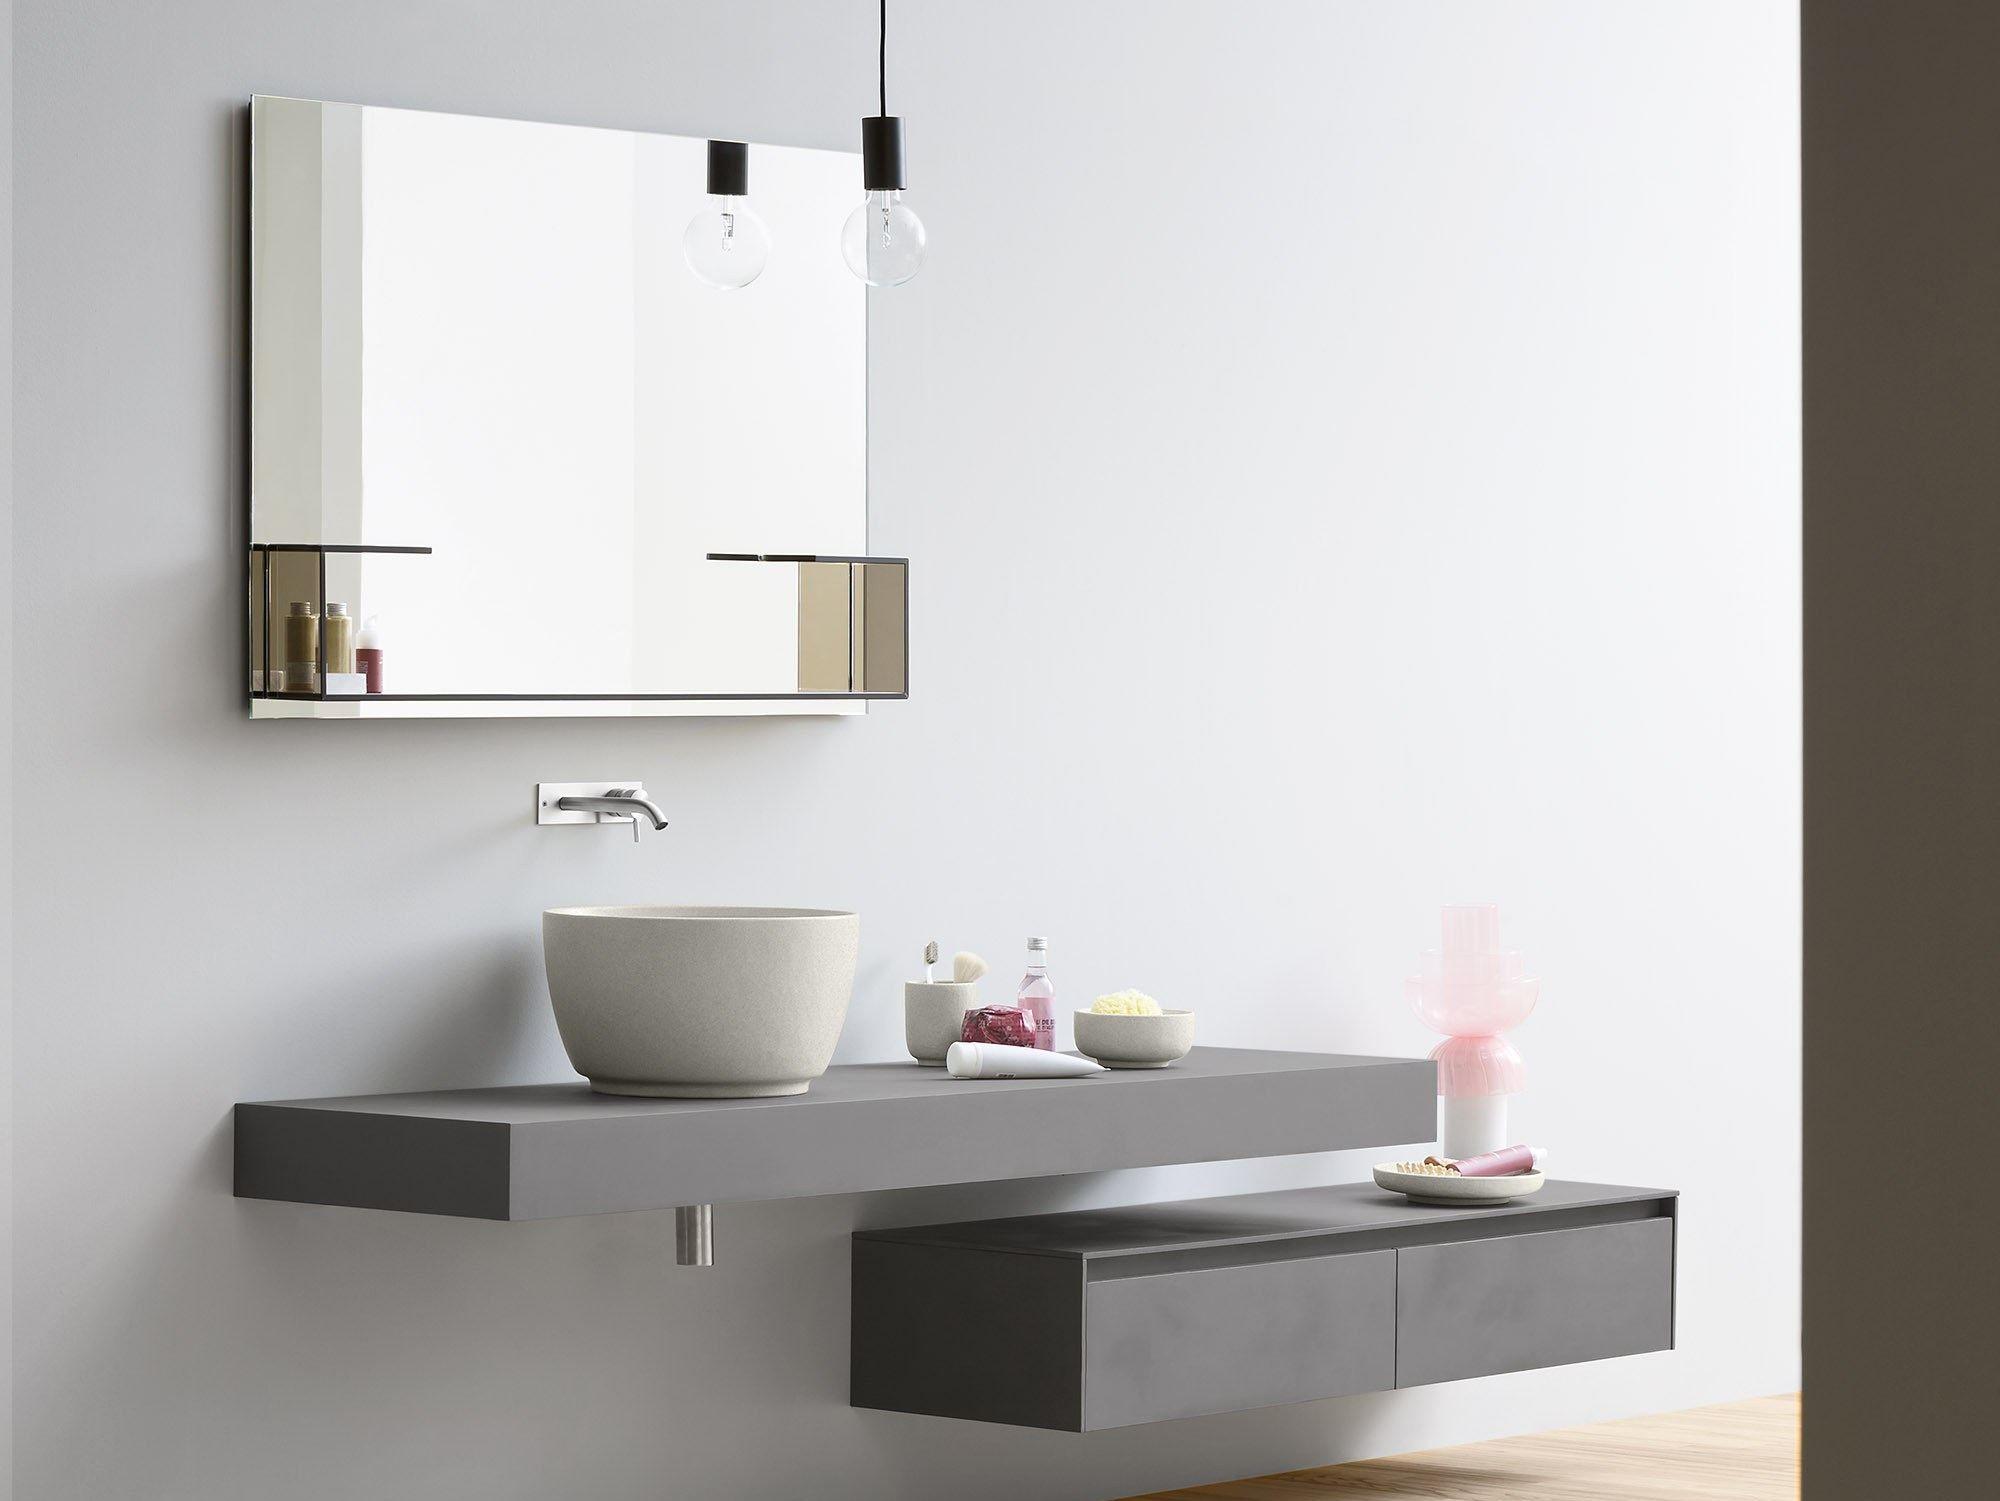 Moode ecomalta vanity unit by rexa design design monica for Design waschtischunterschrank